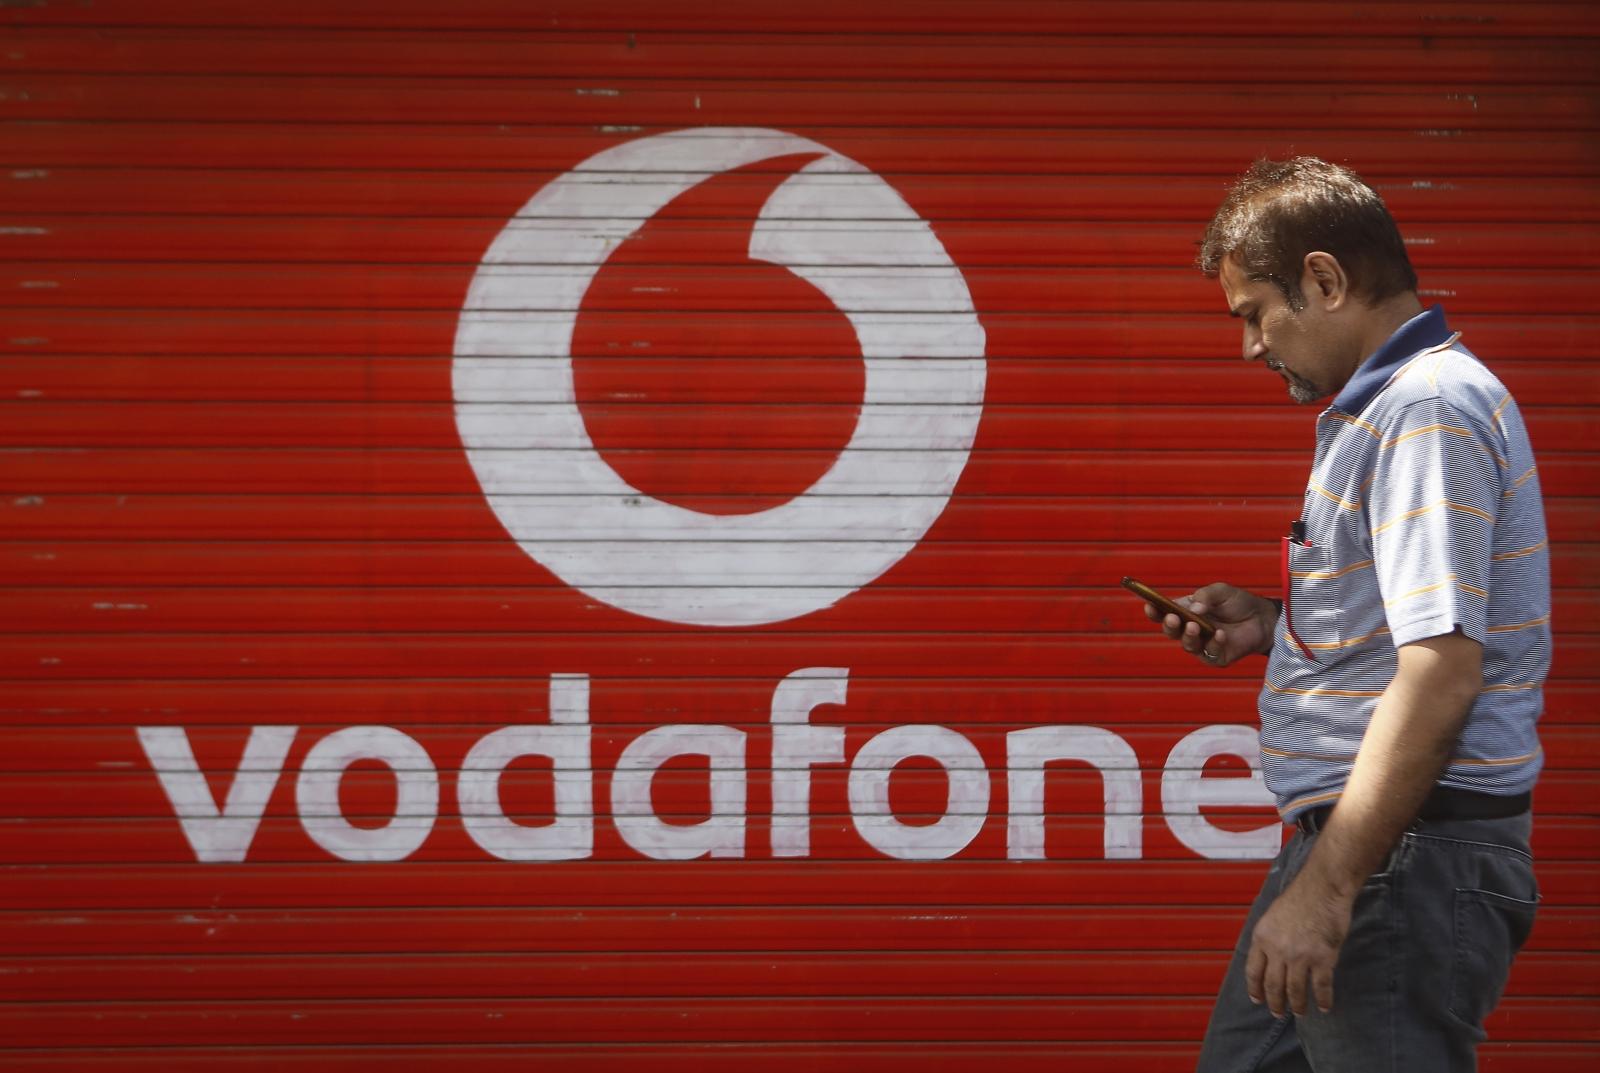 Goldman Sachs on Vodafone